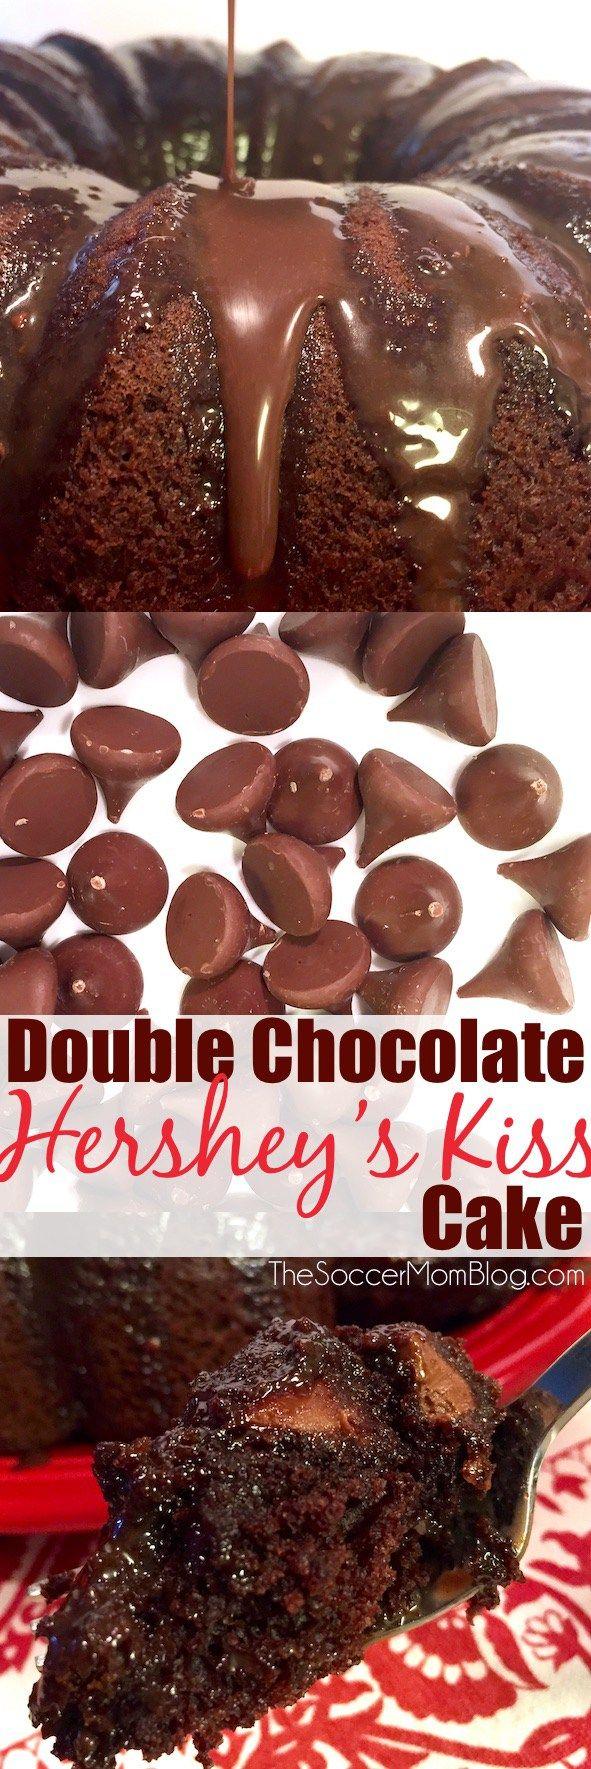 Double Chocolate Hershey's Kiss Cake | Recipe | Perfect chocolate ...